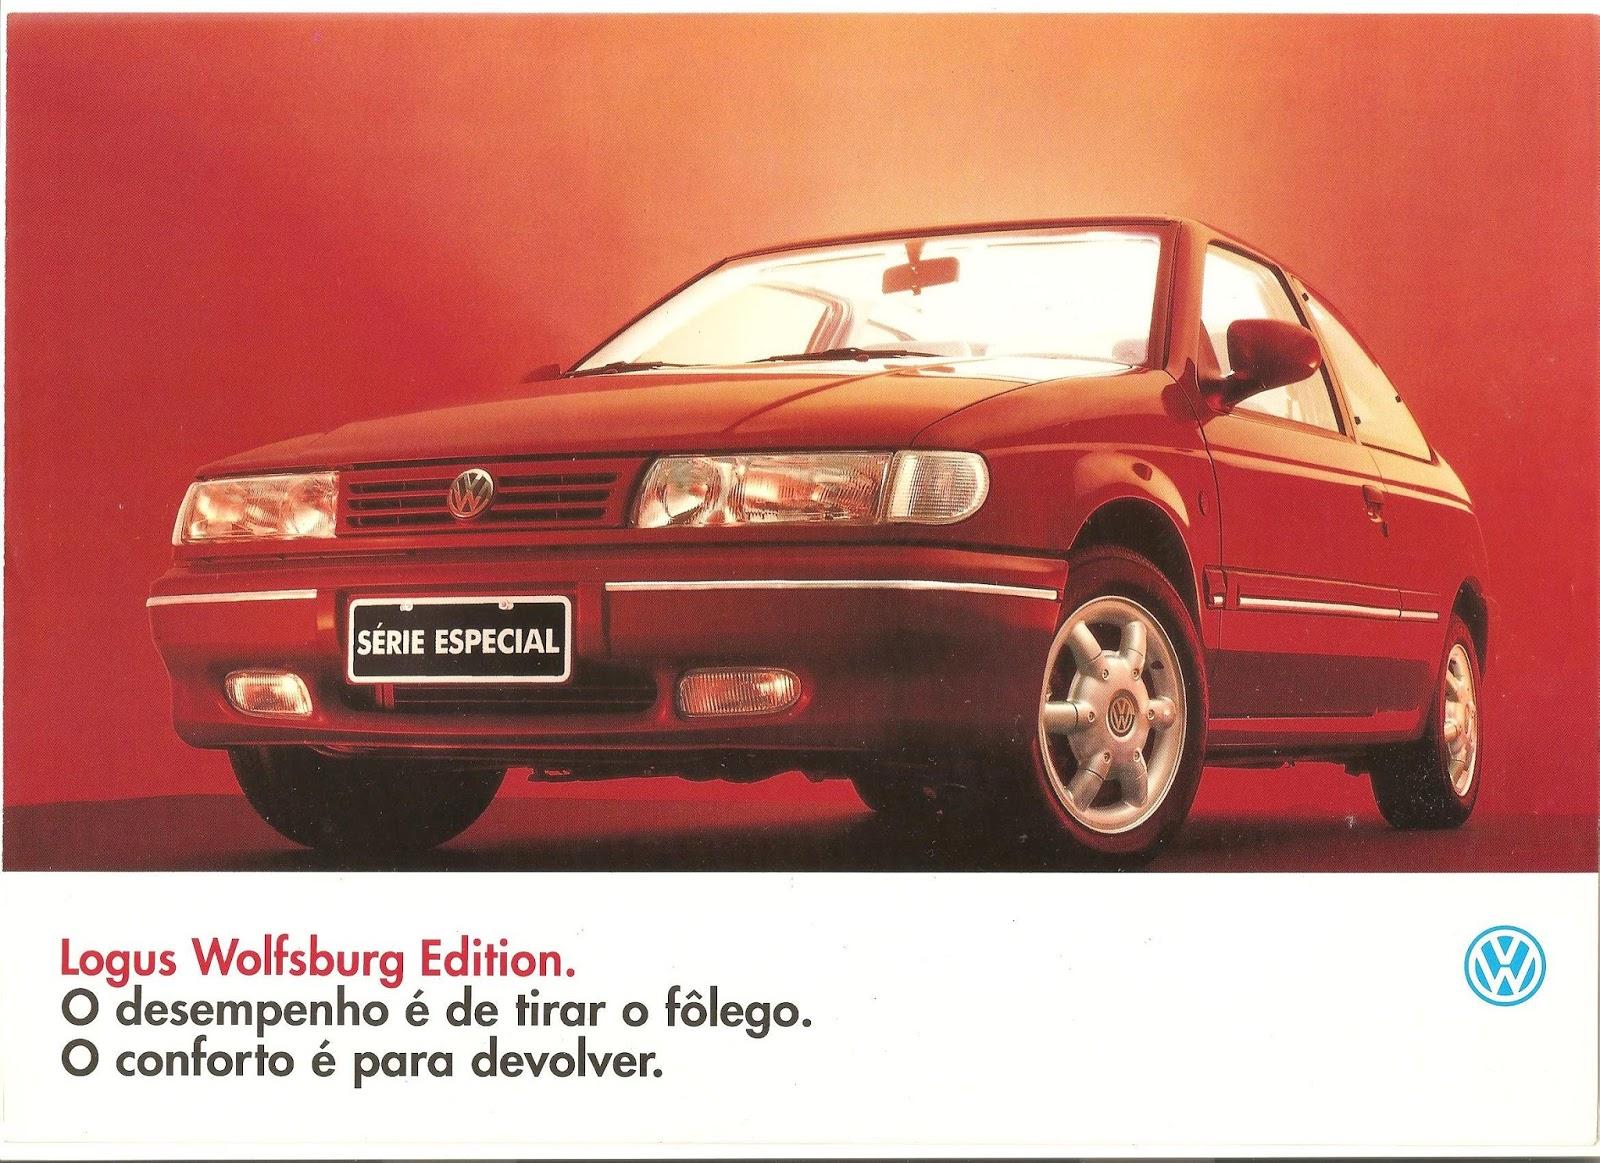 Logus Wolfsburg Edition 06